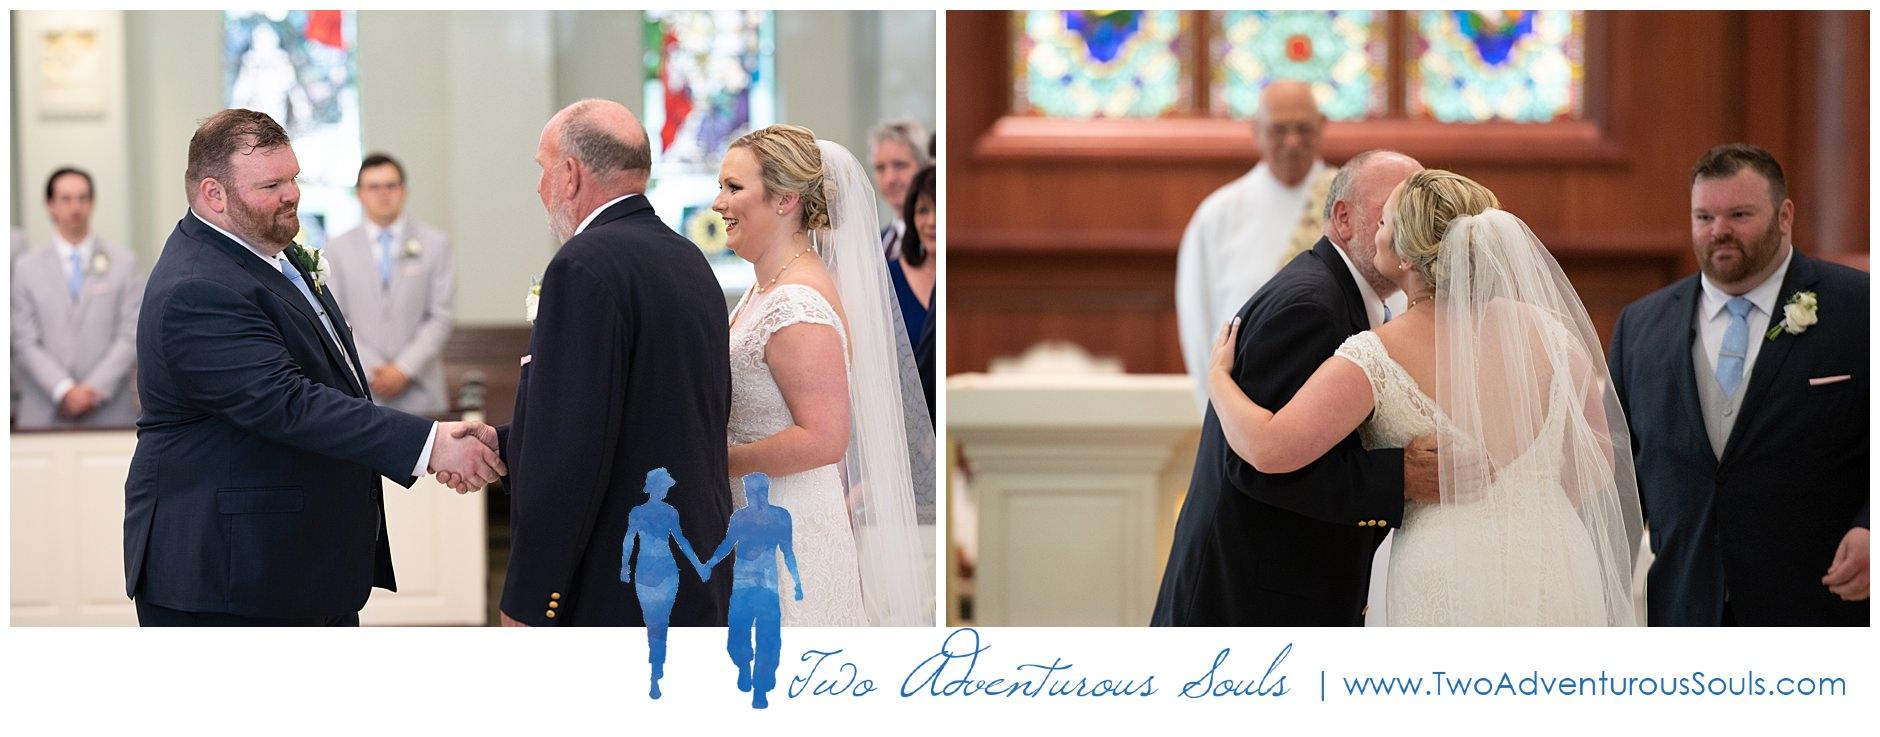 Cape Cod Wedding Photographers, Destination Wedding Photographers, Two Adventurous Souls-081019_0020.jpg